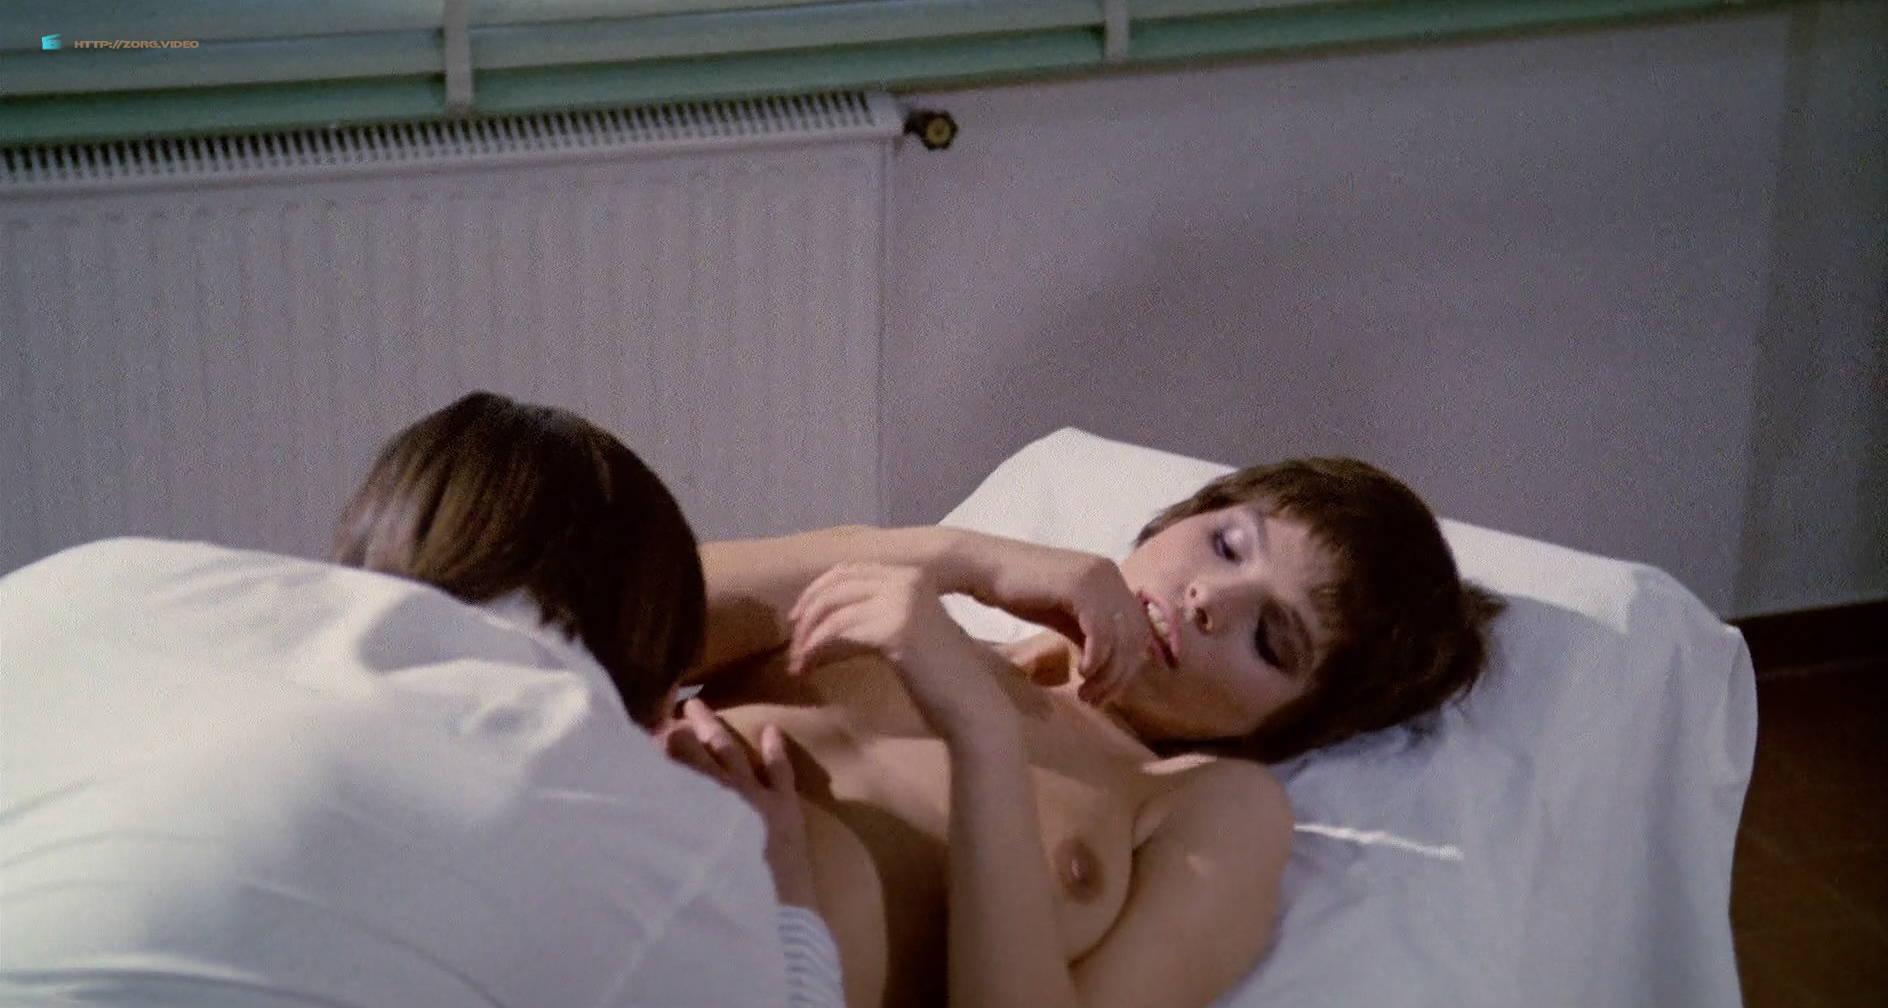 Paola Morra nude full frontal Anita Ekberg sex - Killer Nun (IT-1978) HD 1080p BluRay (4)